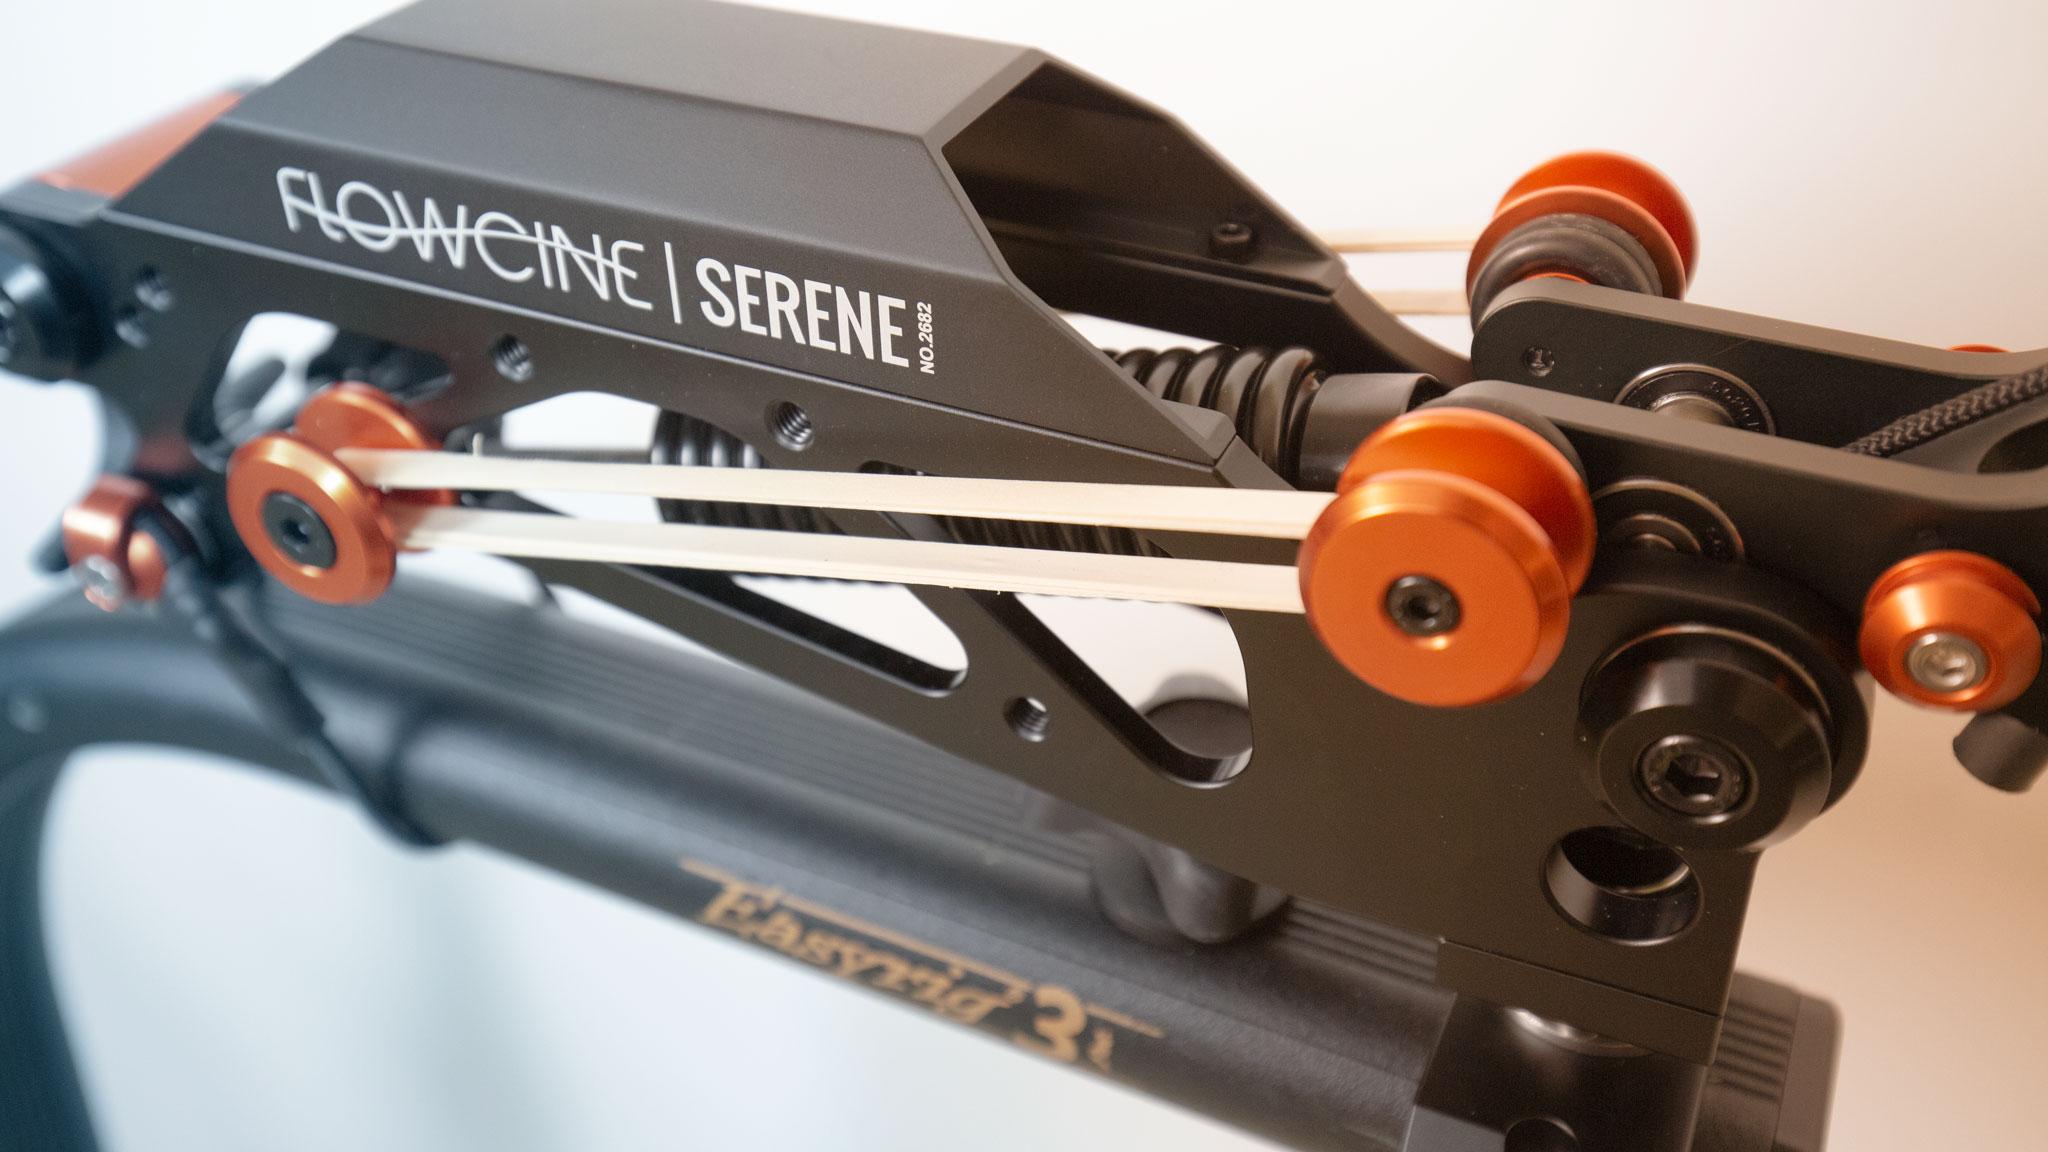 Serene Tough Bands mounted on Serene arm on Easyrig